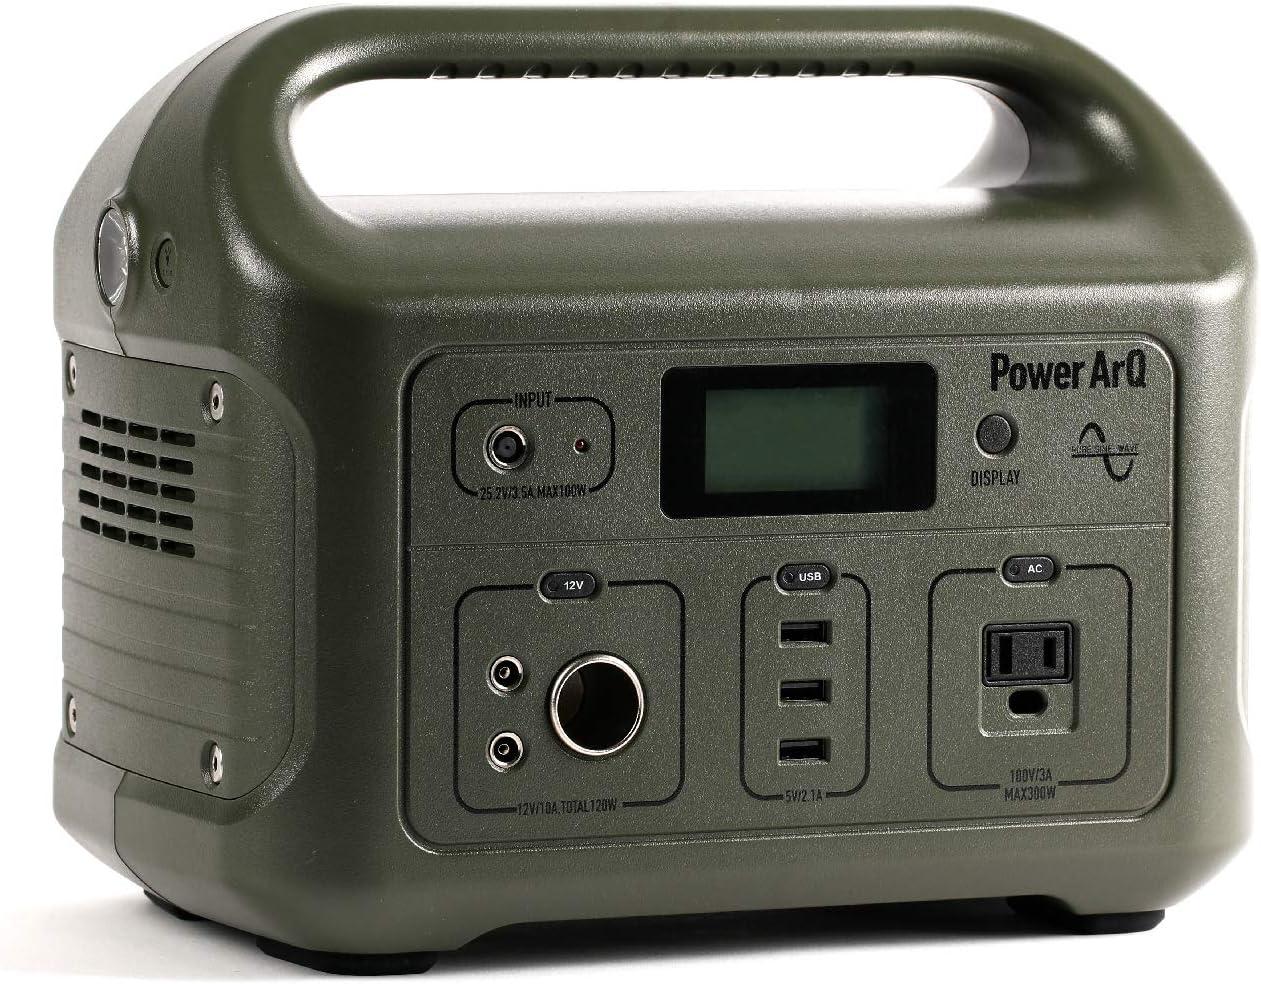 PowerArQ ポータブル電源 626Wh Smart Tap/スマートタップ(Smart Tap)